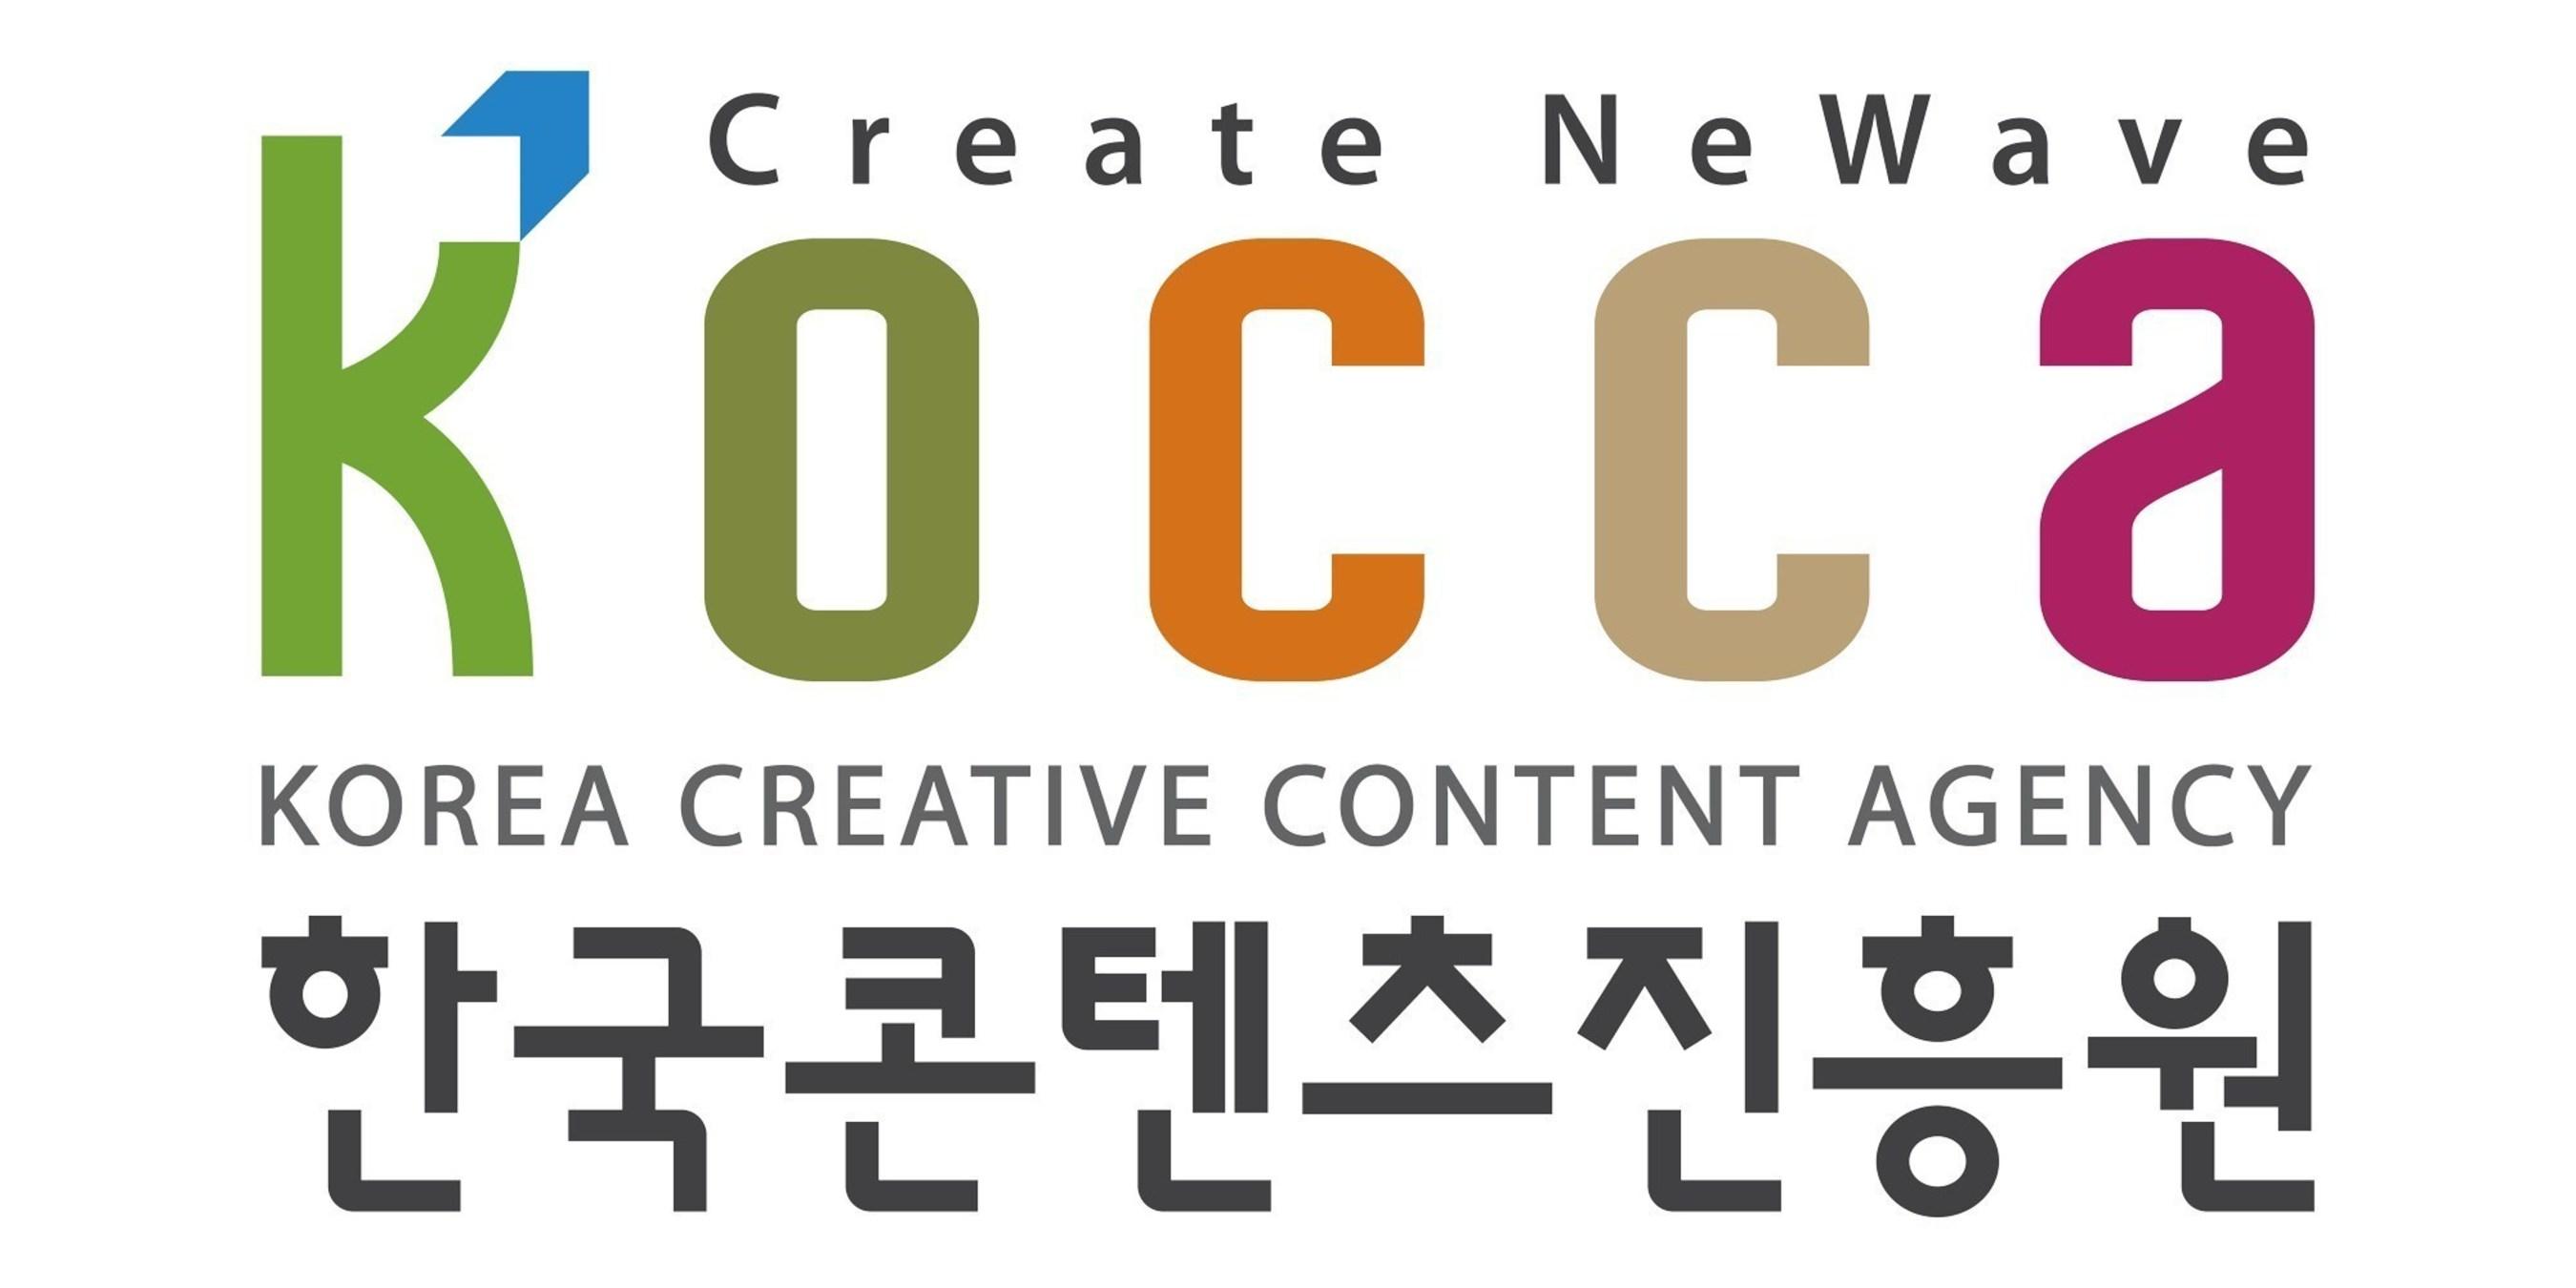 KOCCA logo